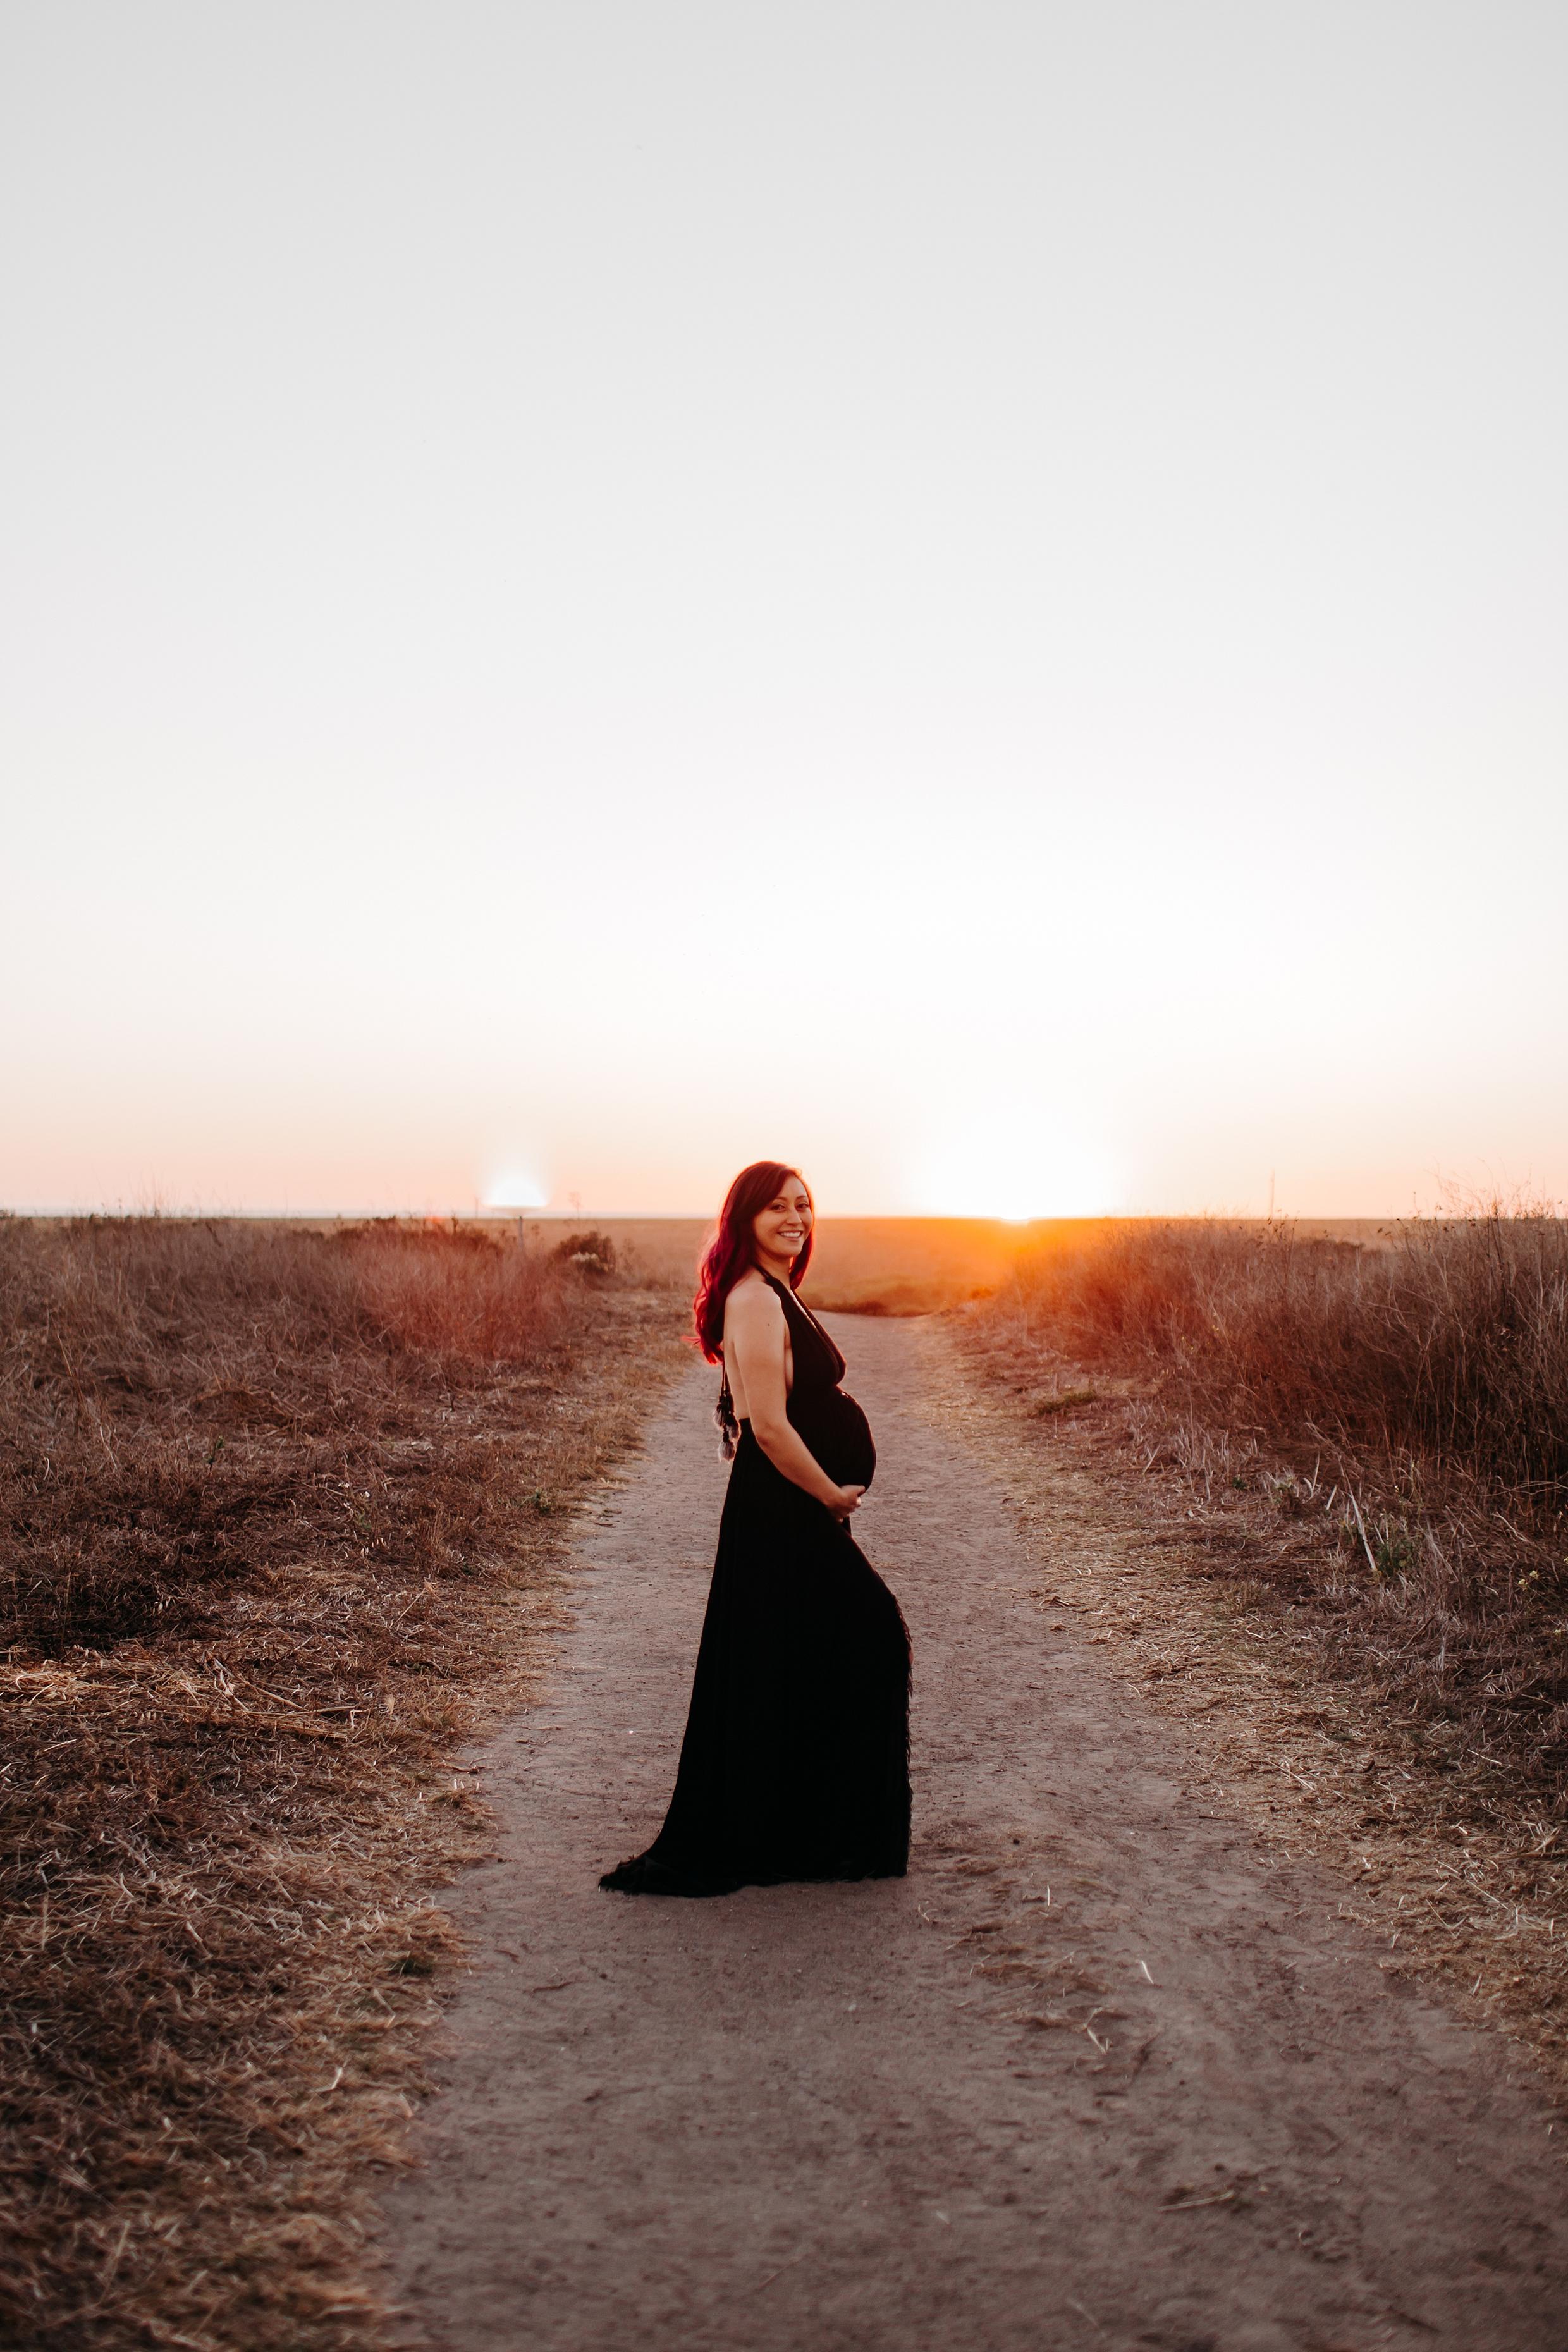 Bryanna-San-Antonio-Maternity-Photographer-101_WEB.jpg